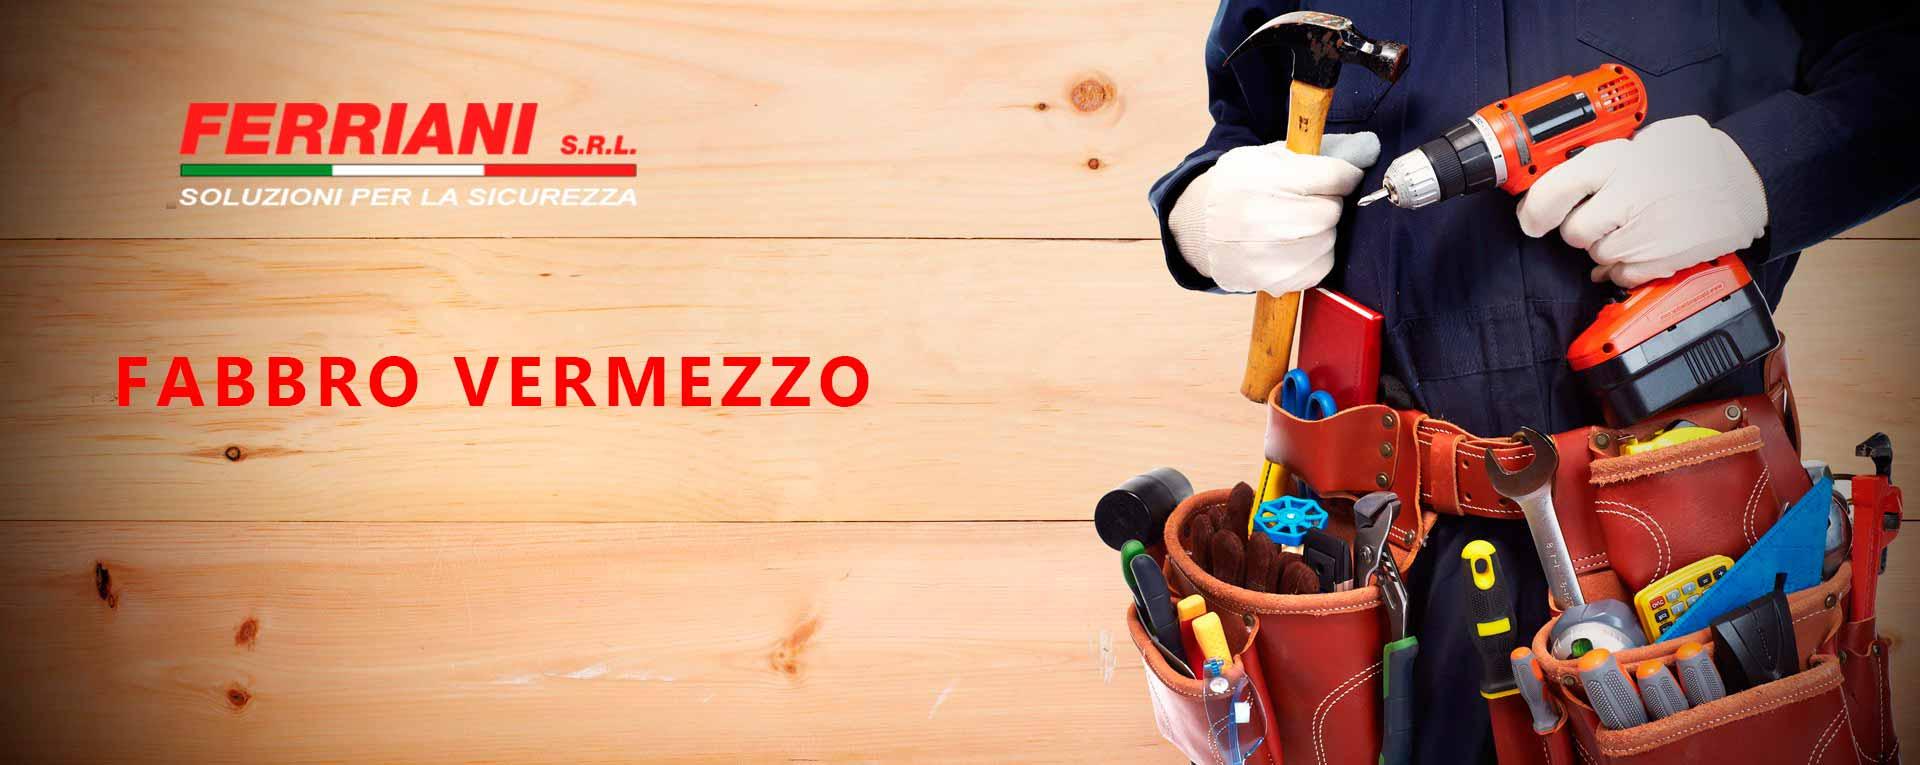 Fabbro Vermezzo